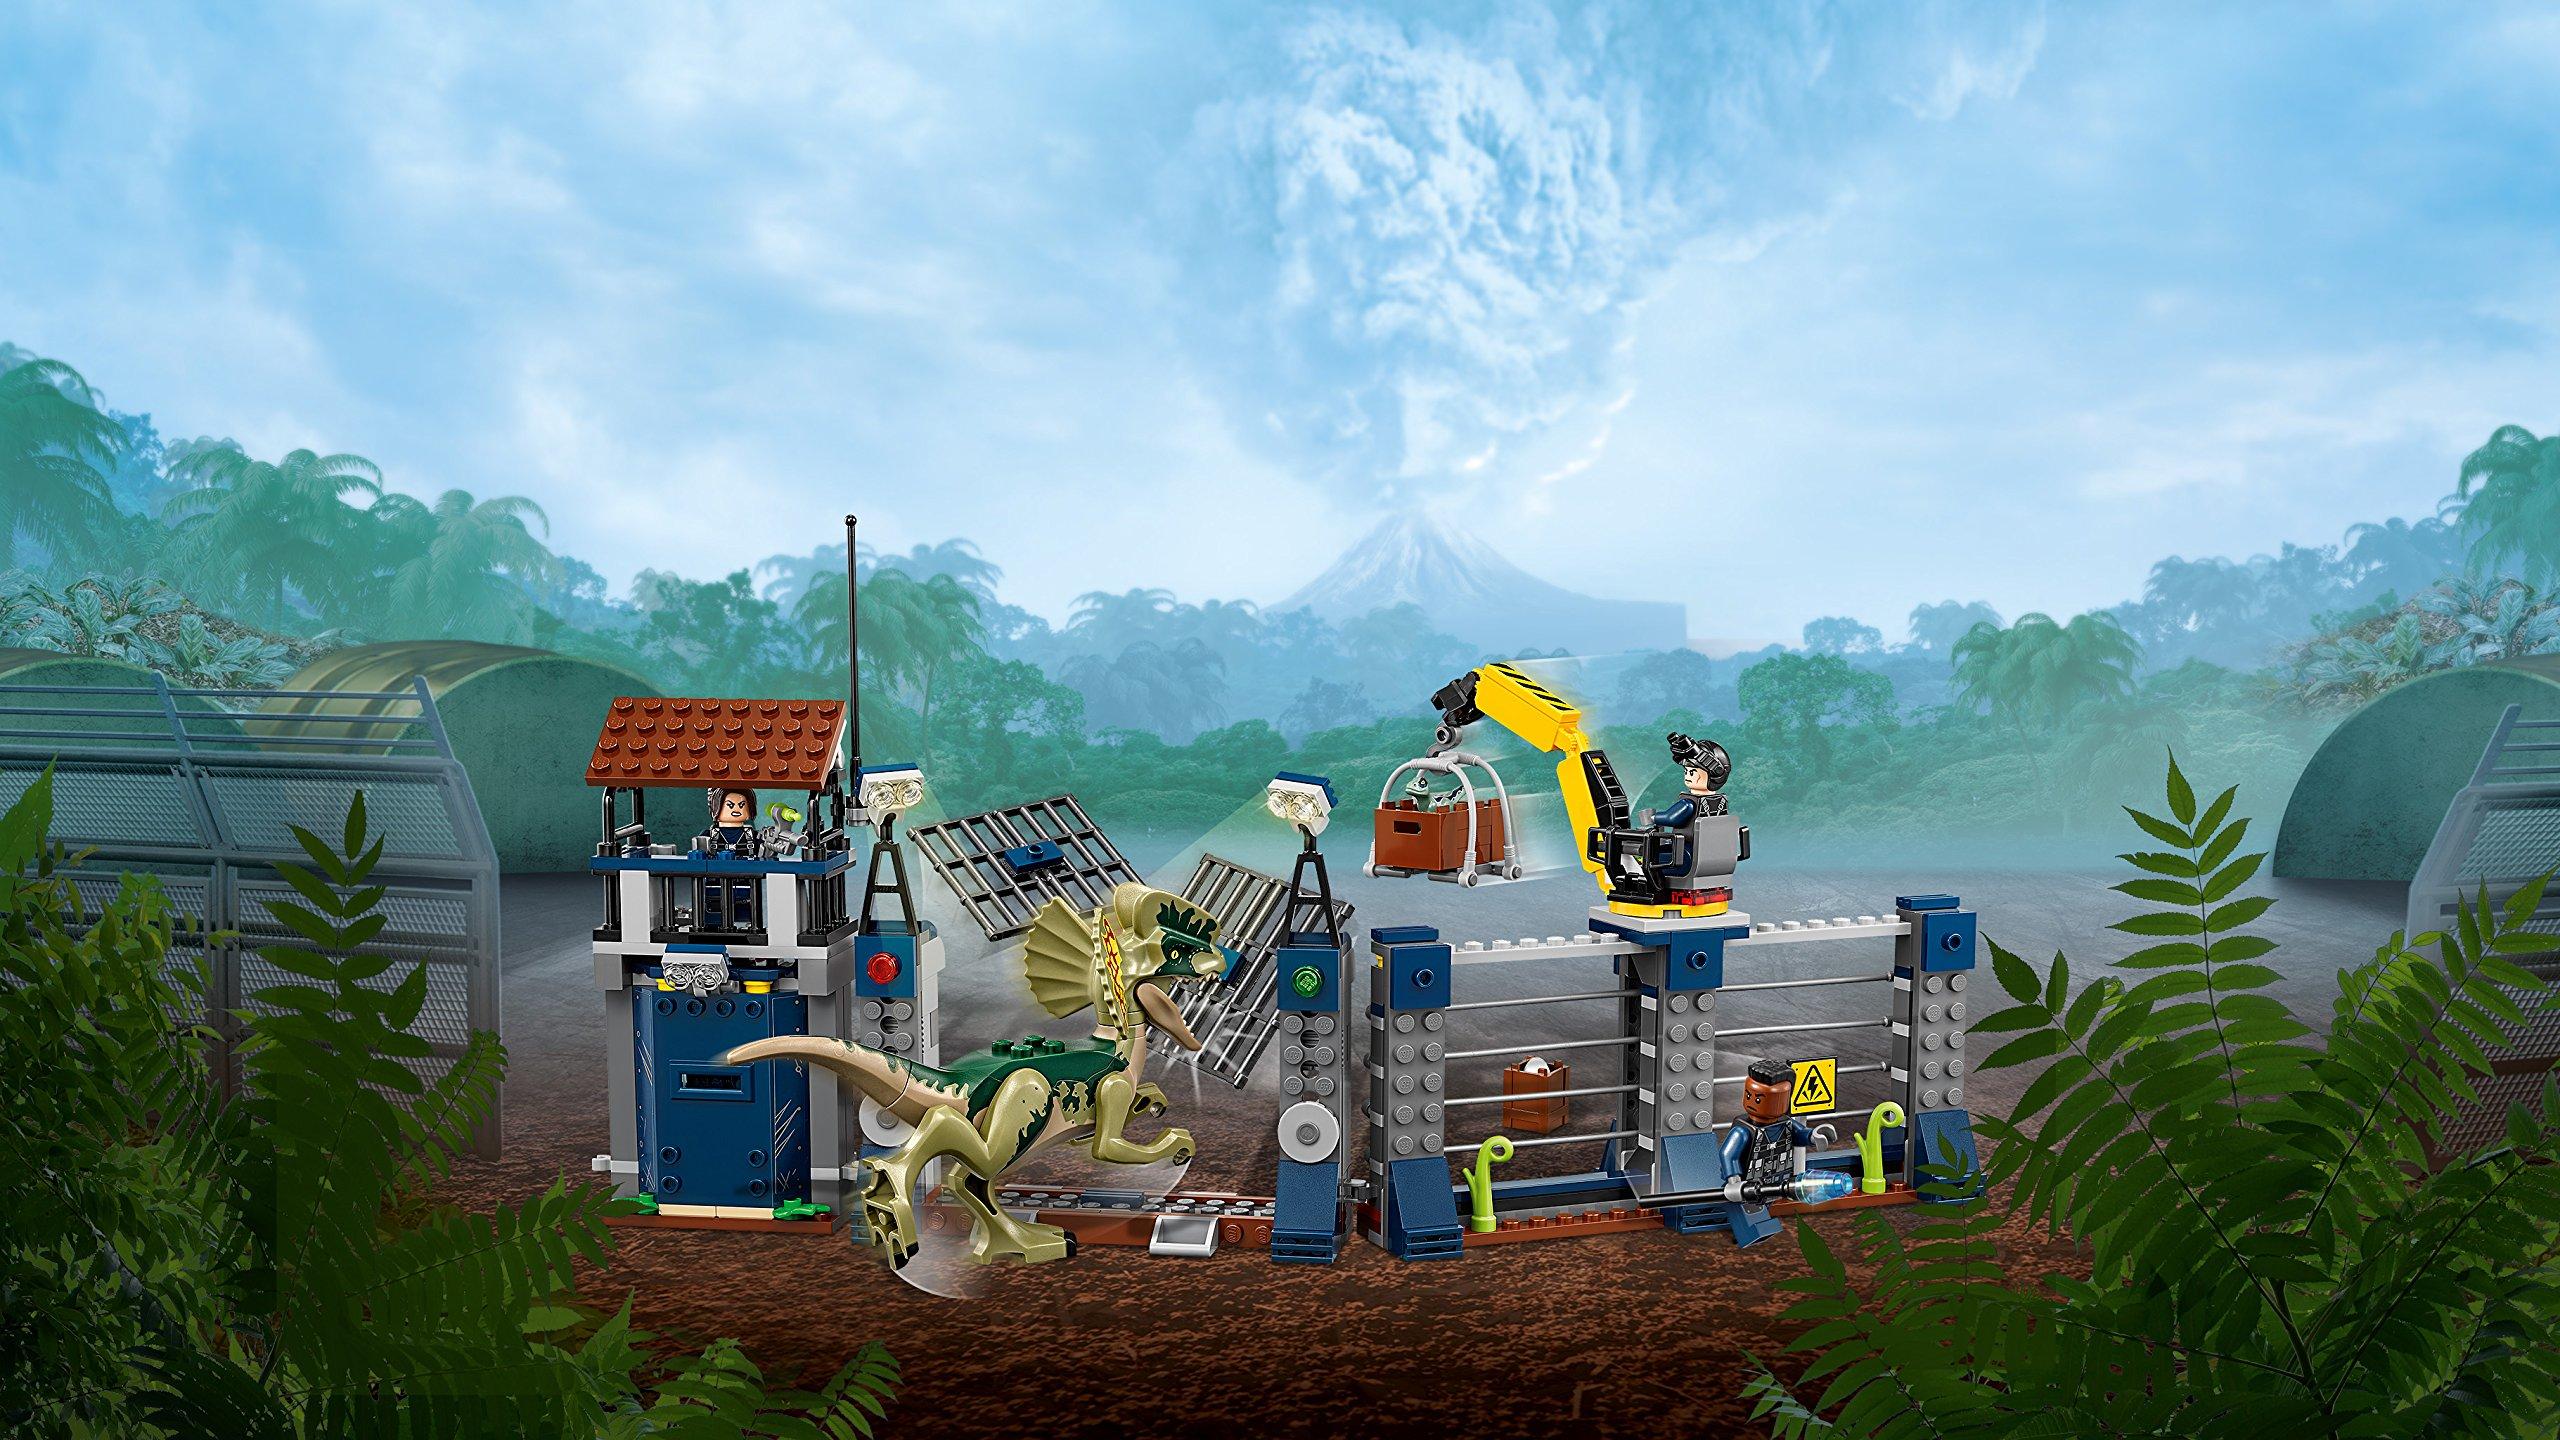 LEGO 75931 Jurassic World Dilophosaurus Outpost Attack Playset, Dinosaur Figures, Build & Play Dinosaur Toys for Kids by LEGO (Image #5)